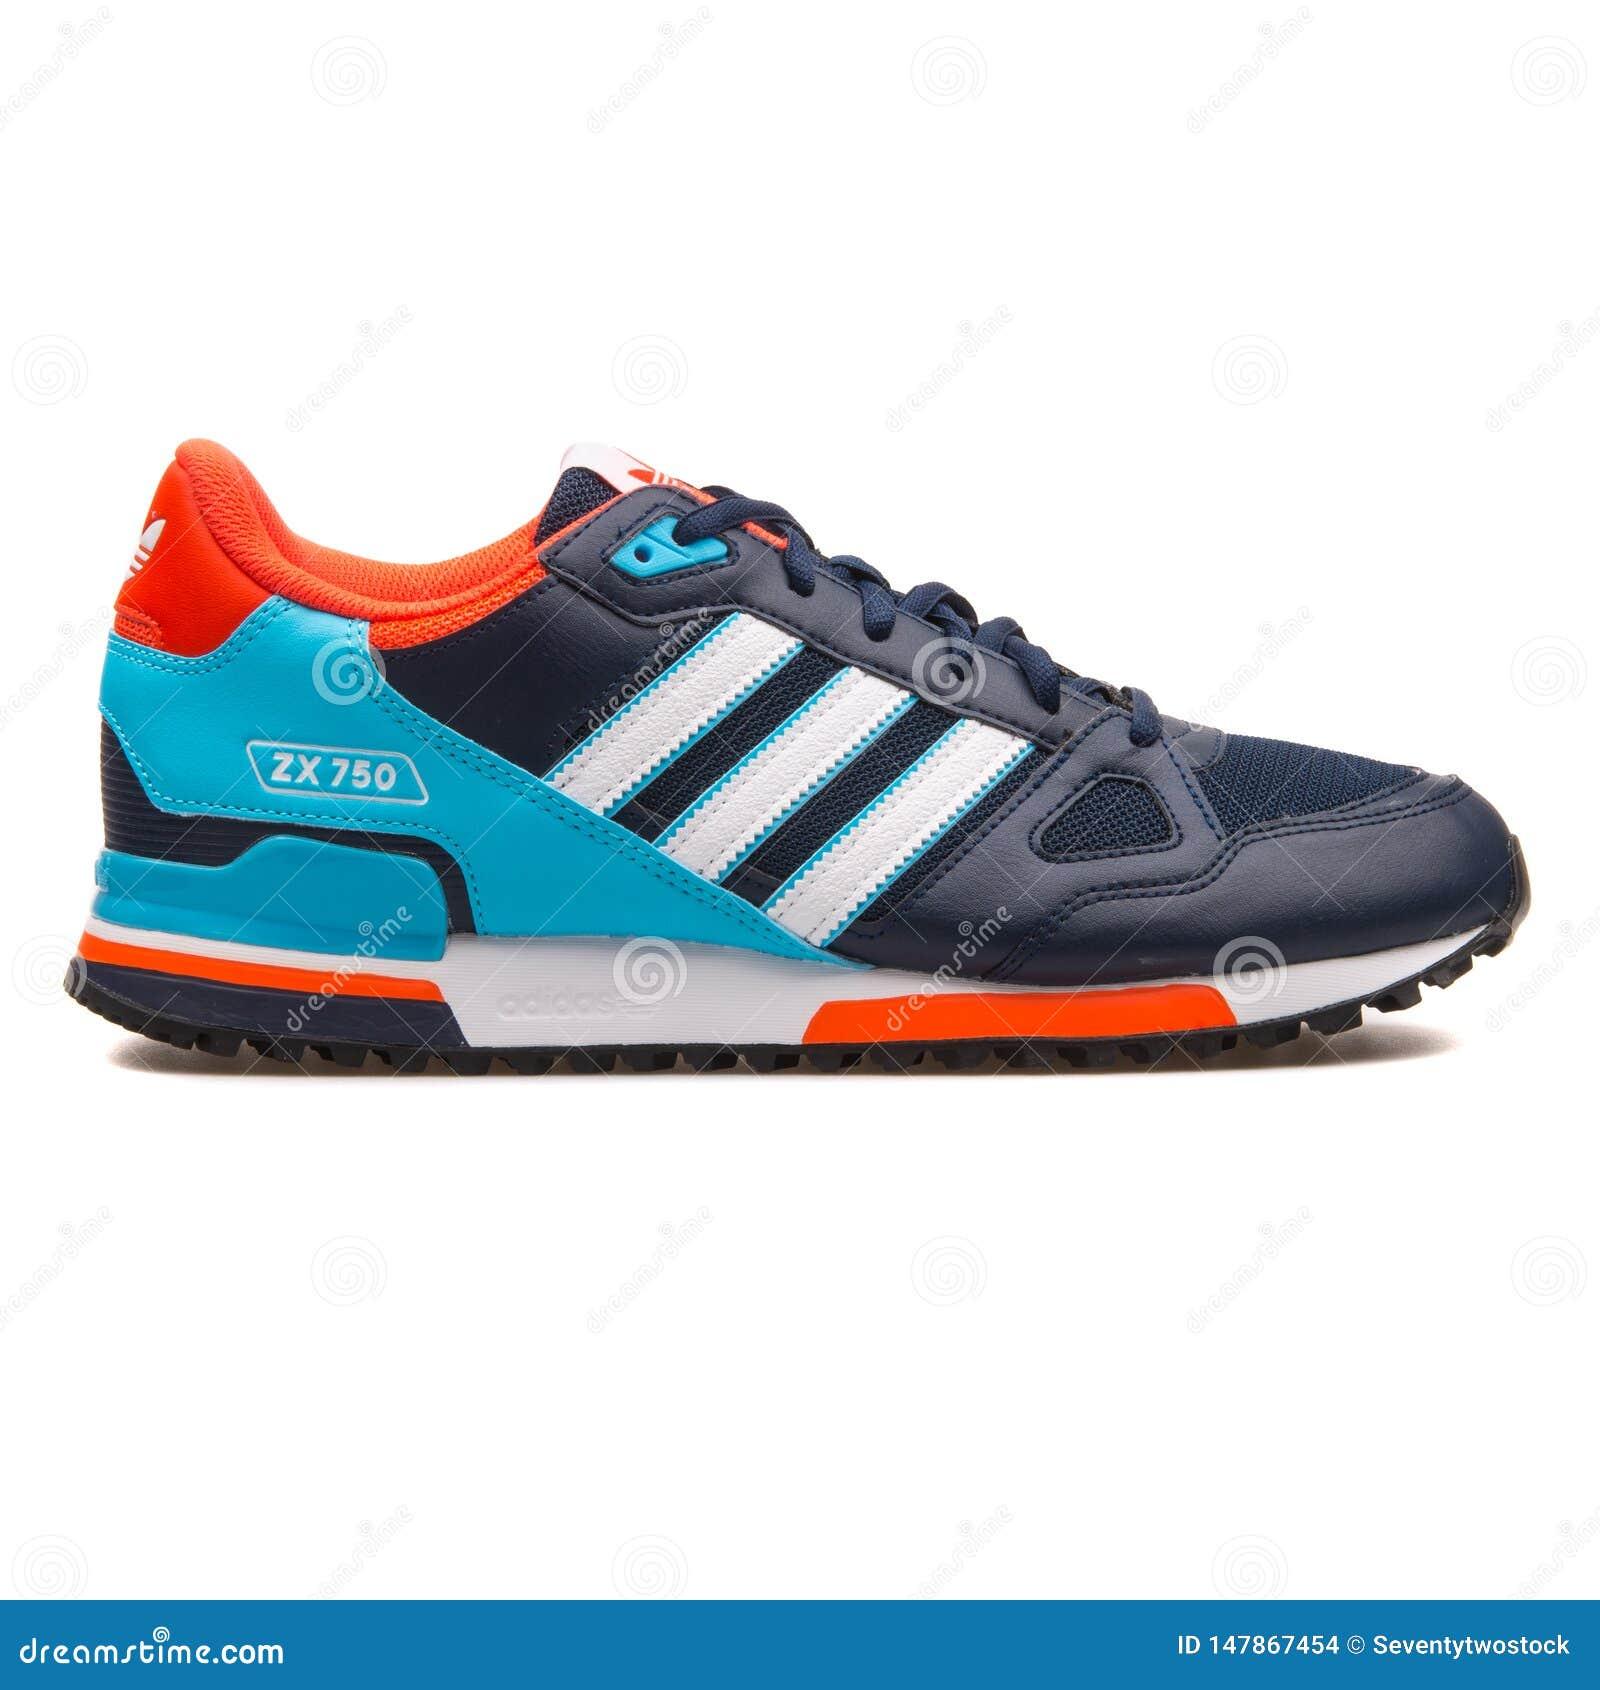 adidas zx 750 bleu marine prix